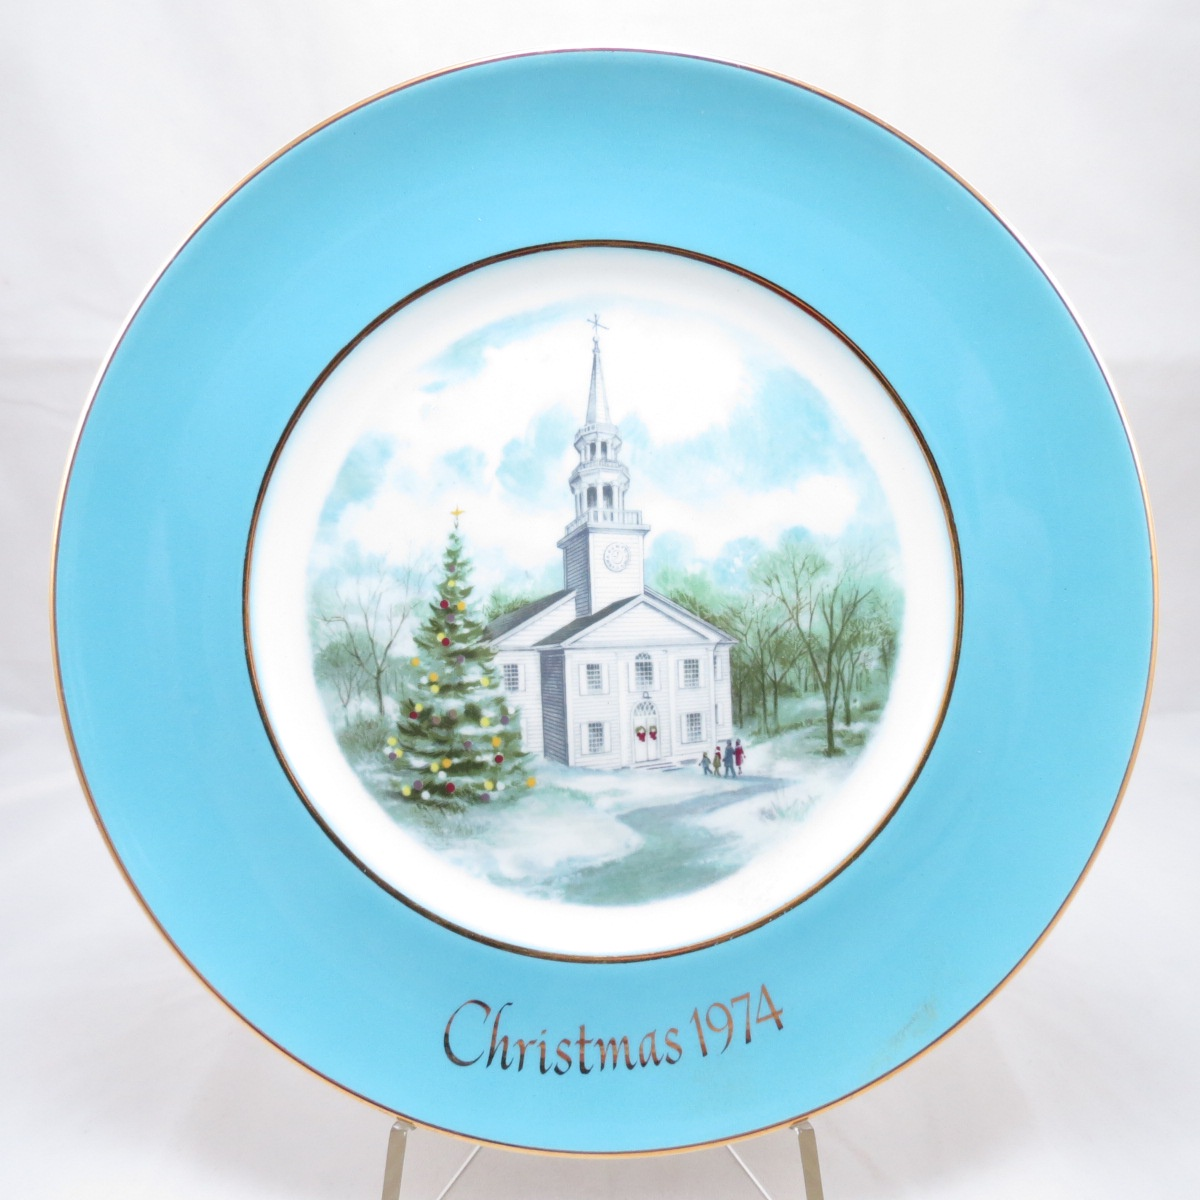 Декоративная тарелка Avon Products, Inc. Рождественские Воспоминания Эйвон, 101337414 avon 200